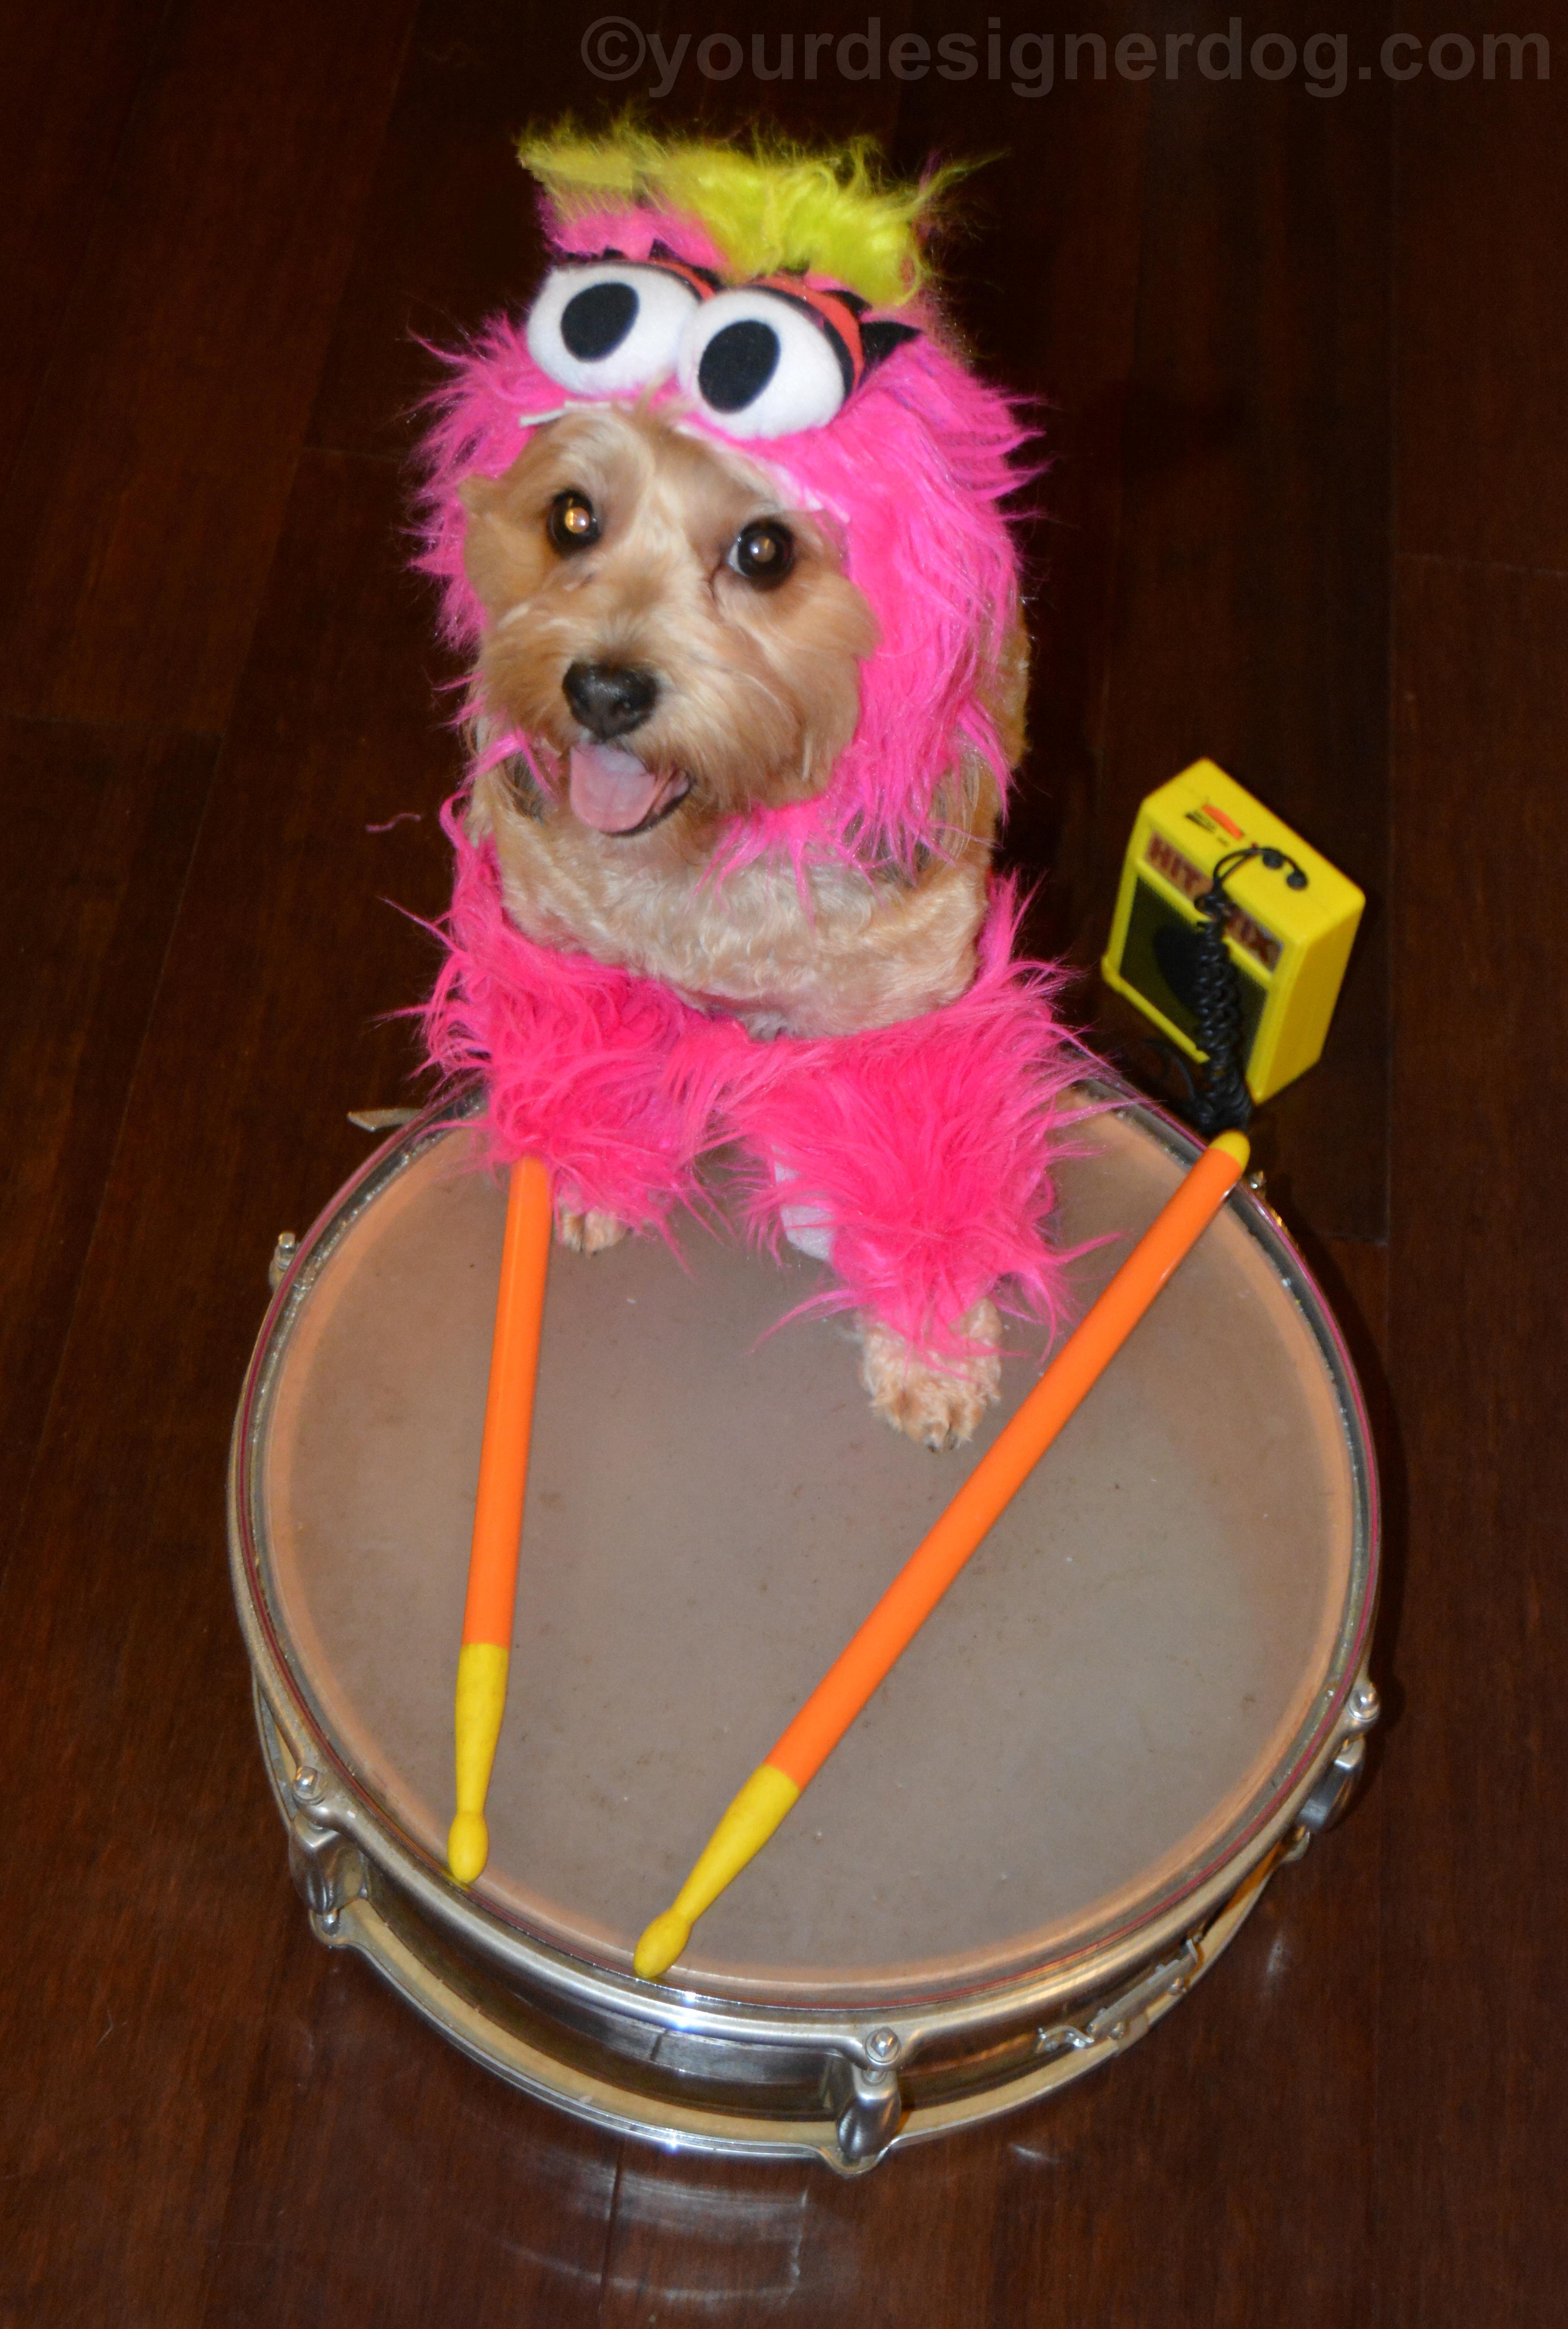 dogs, designer dogs, yorkipoo, yorkie poo, animal, drum, Muppet, Halloween, monster costume